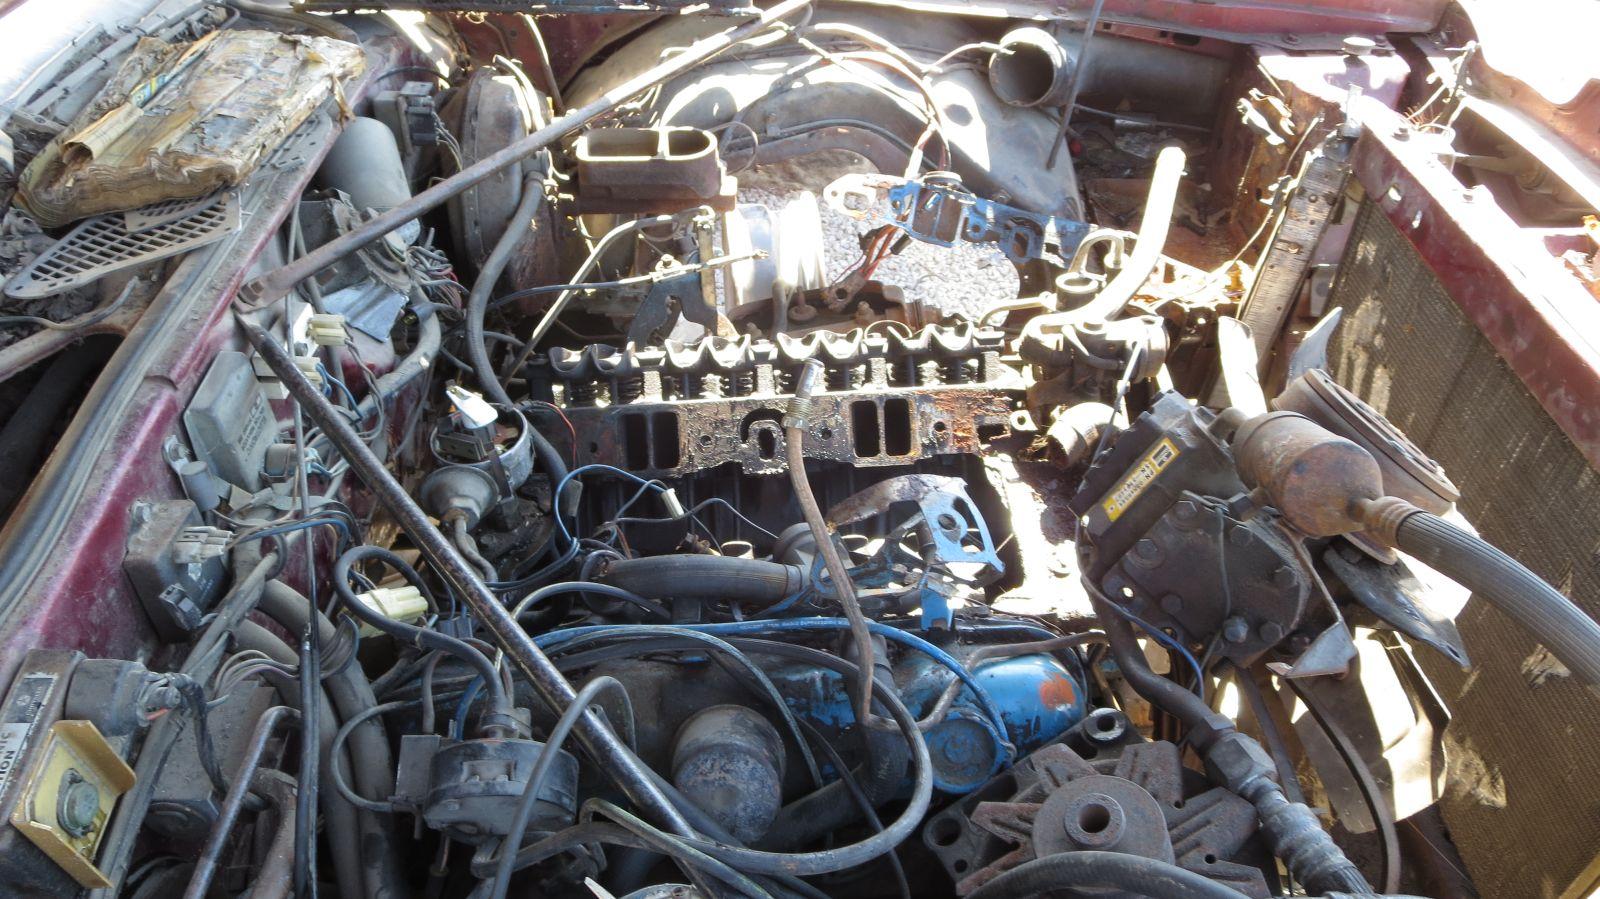 1977 Chrysler Cordoba 360 engine